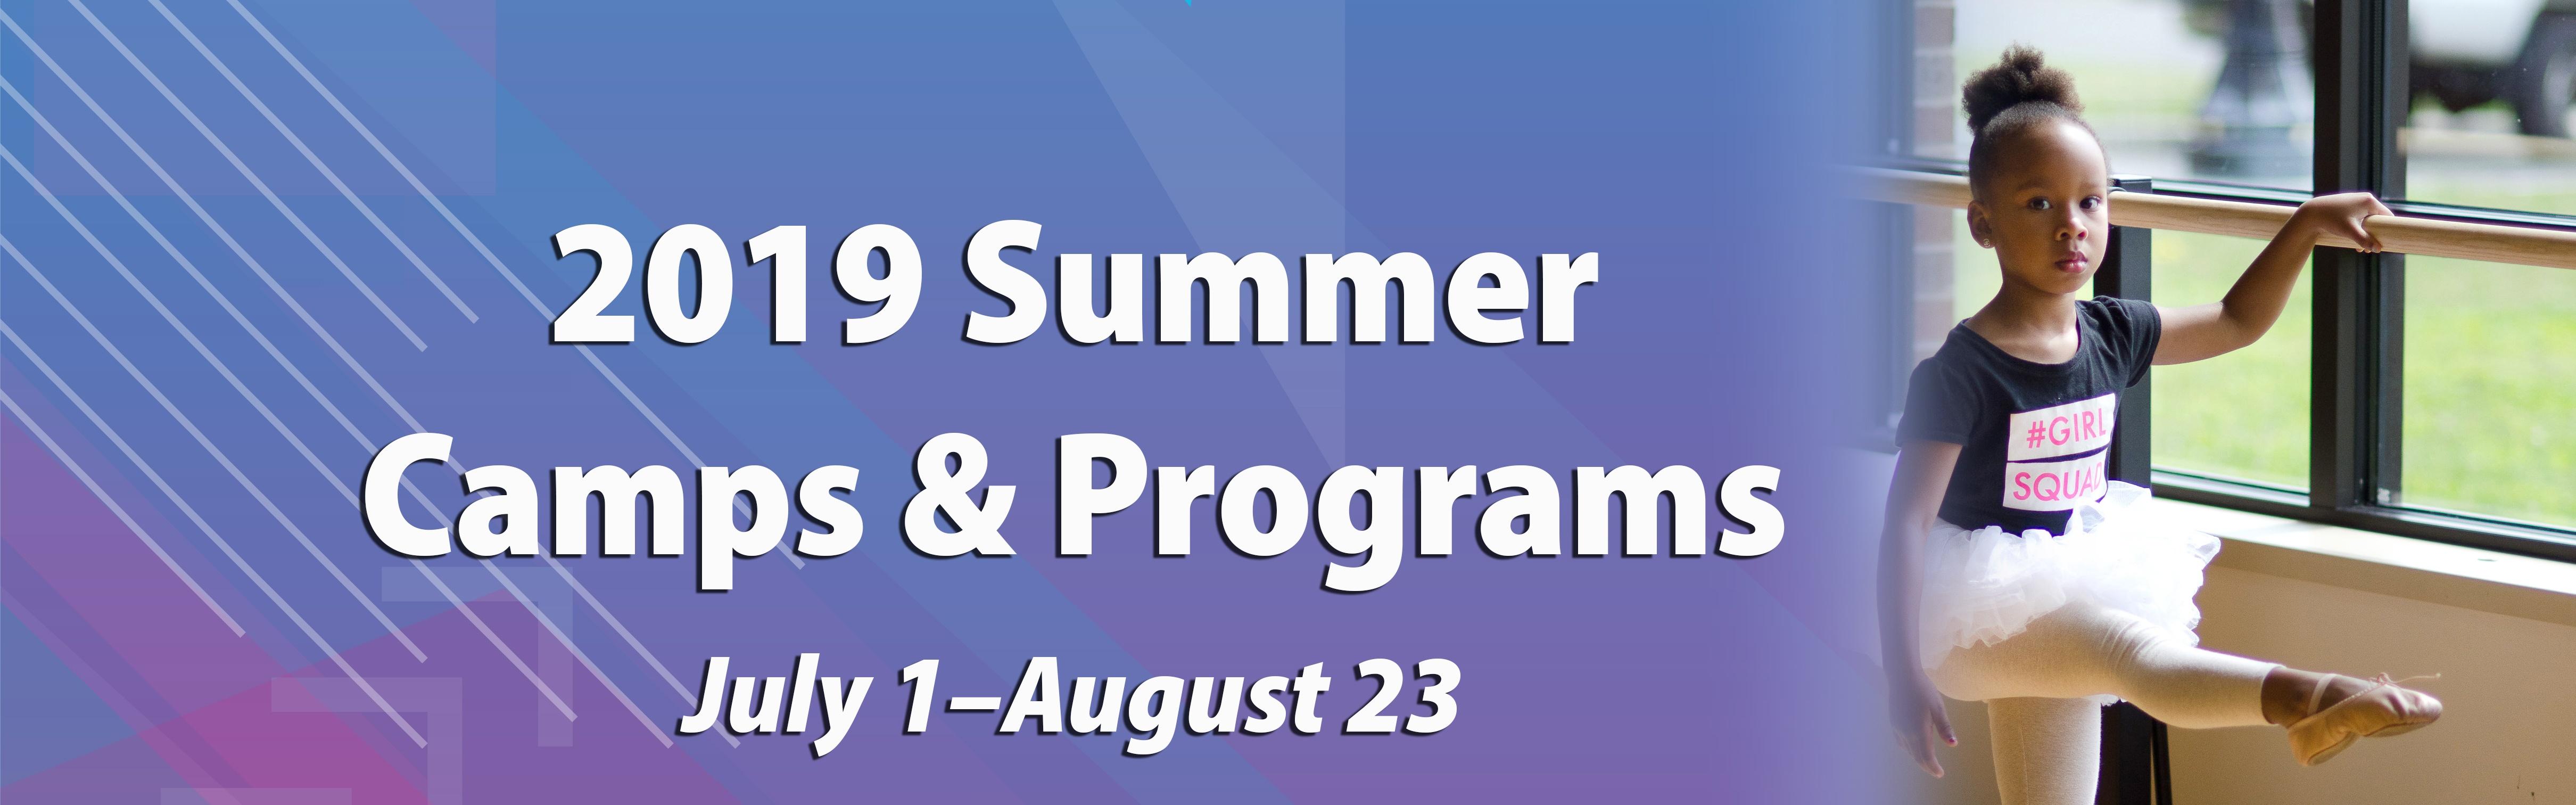 2019 Summer Camps & Programs